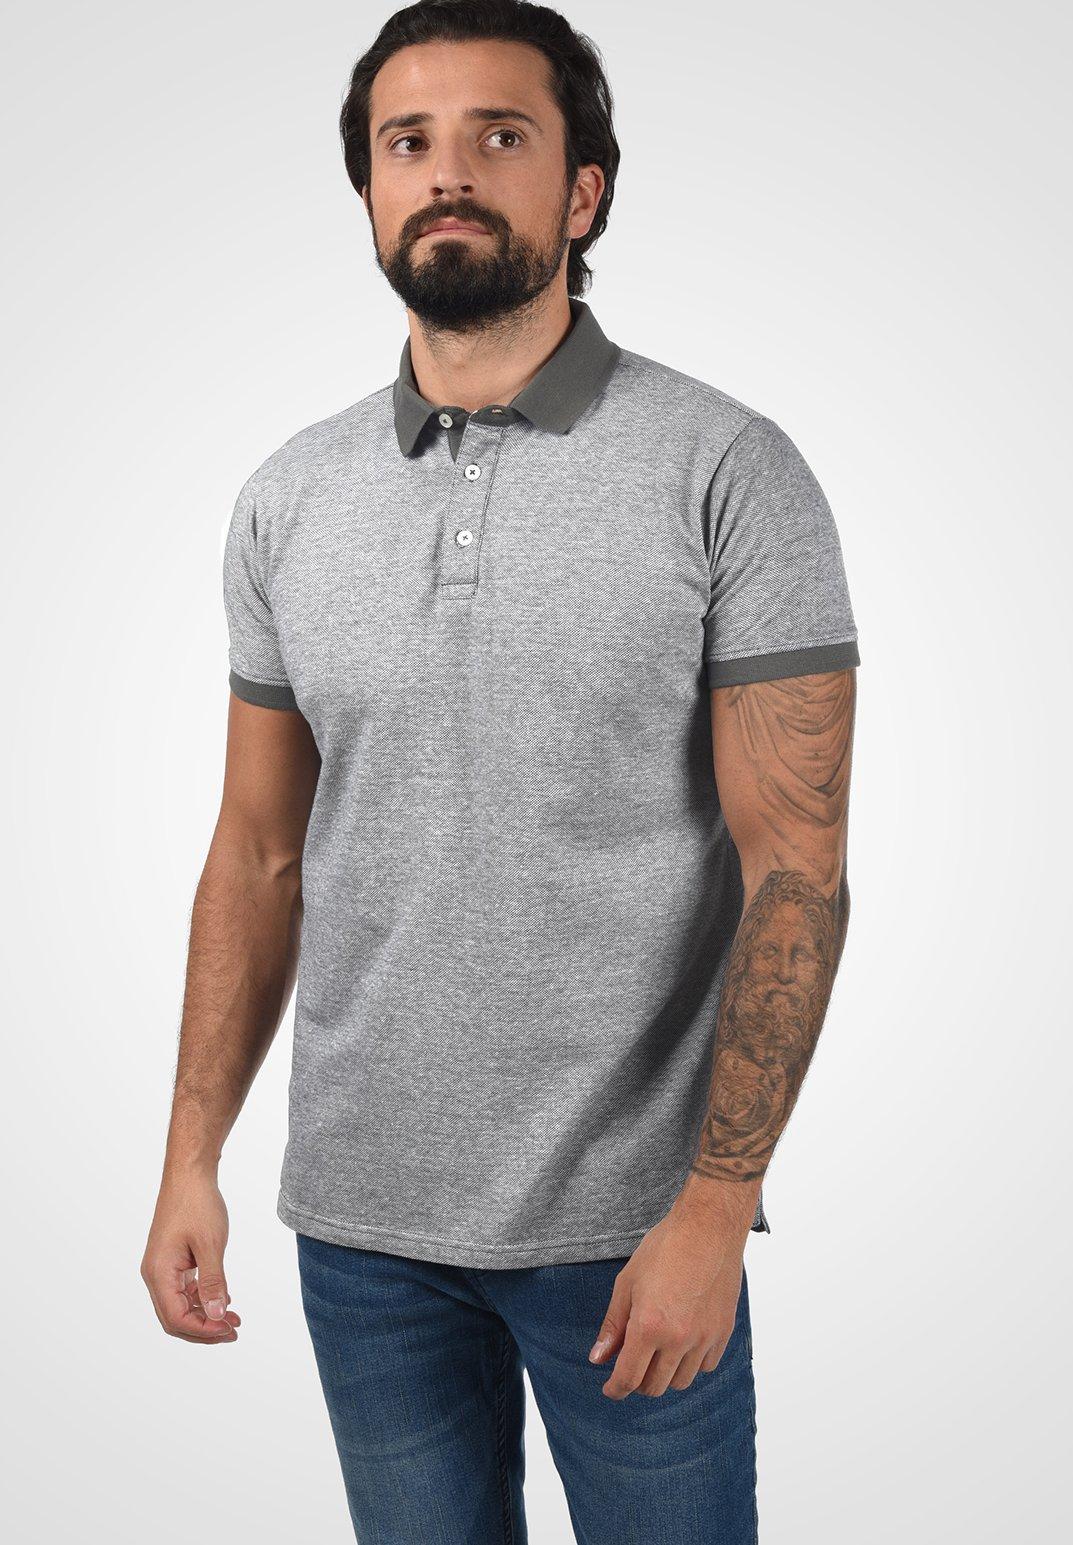 Herrer PANOS - Poloshirts